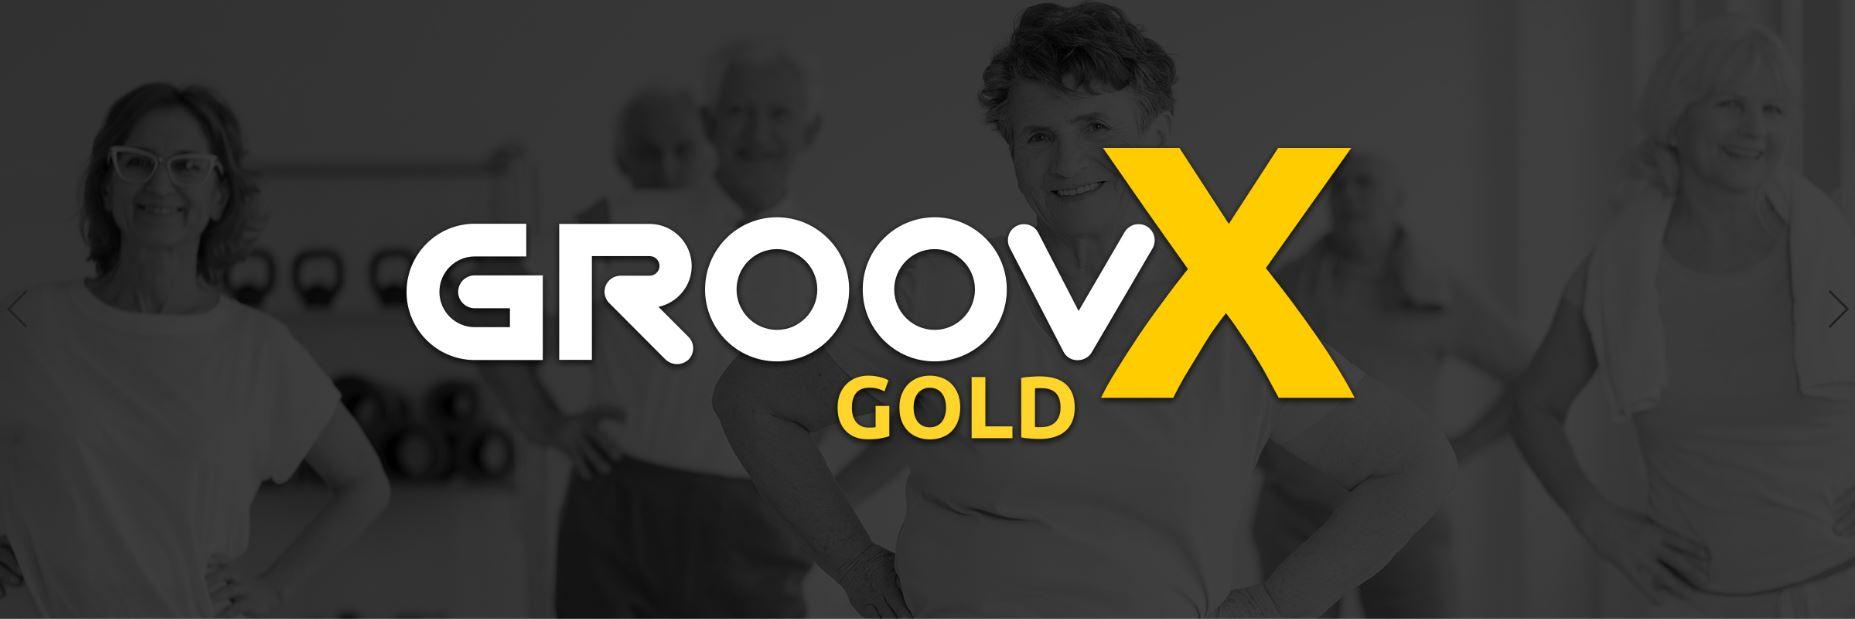 groovX Gold Logo web